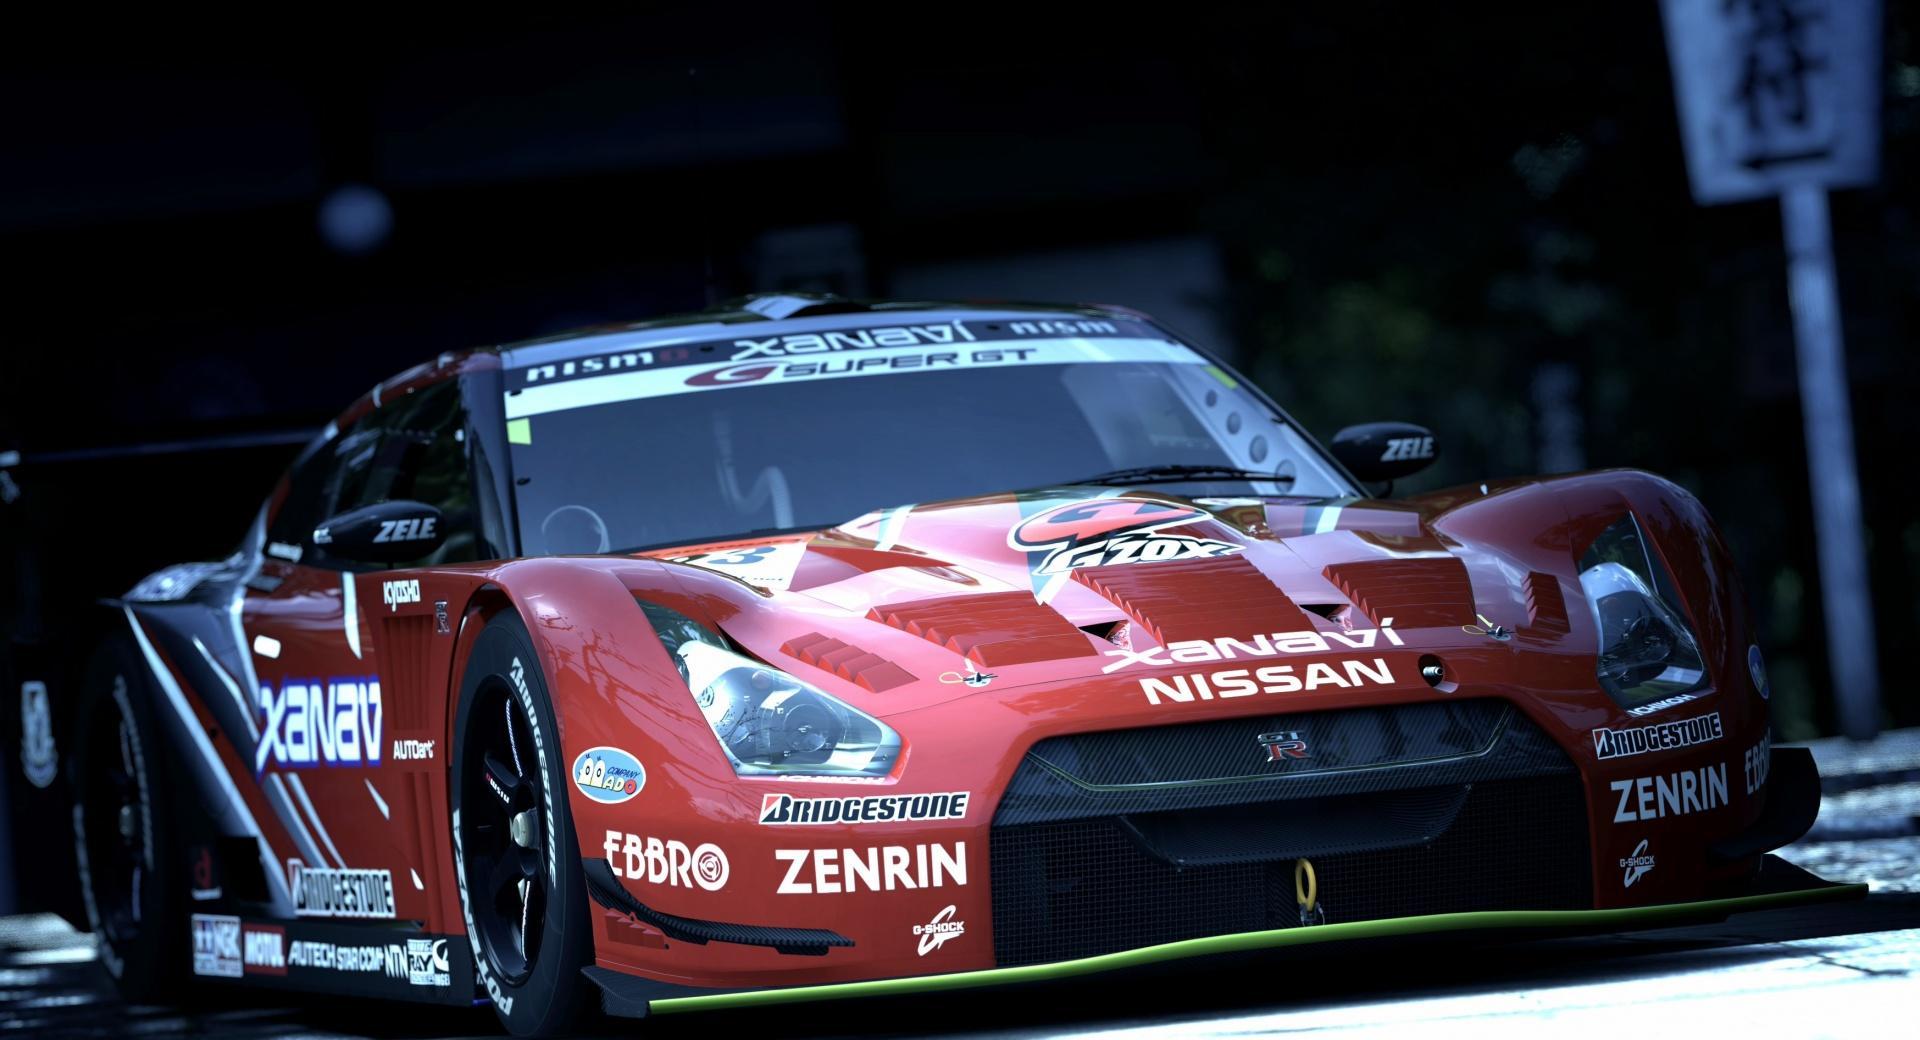 Gran Turismo 5 Nissan GTR wallpapers HD quality